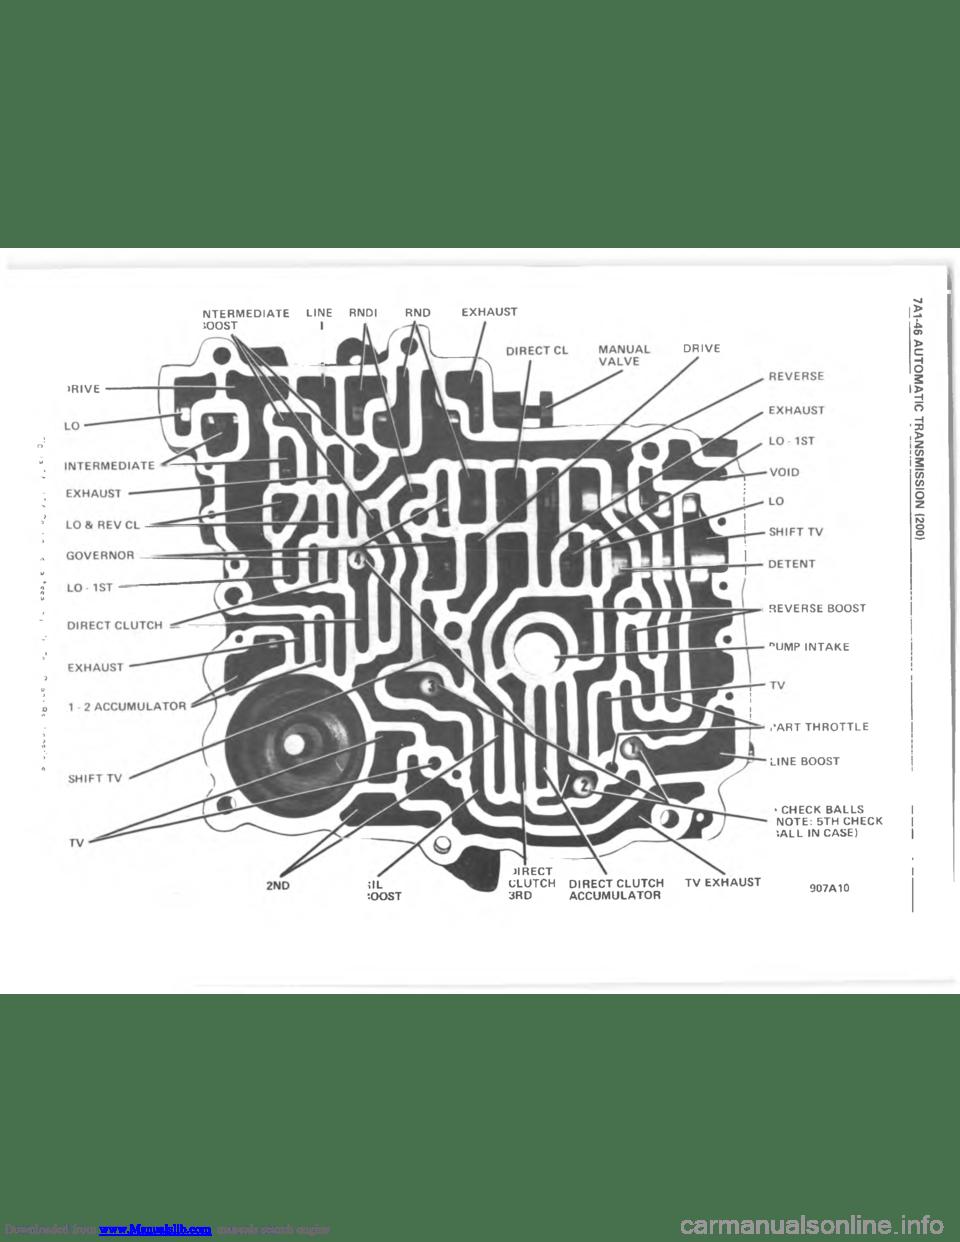 CHEVROLET MONTE CARLO 1980 3.G Workshop Manual